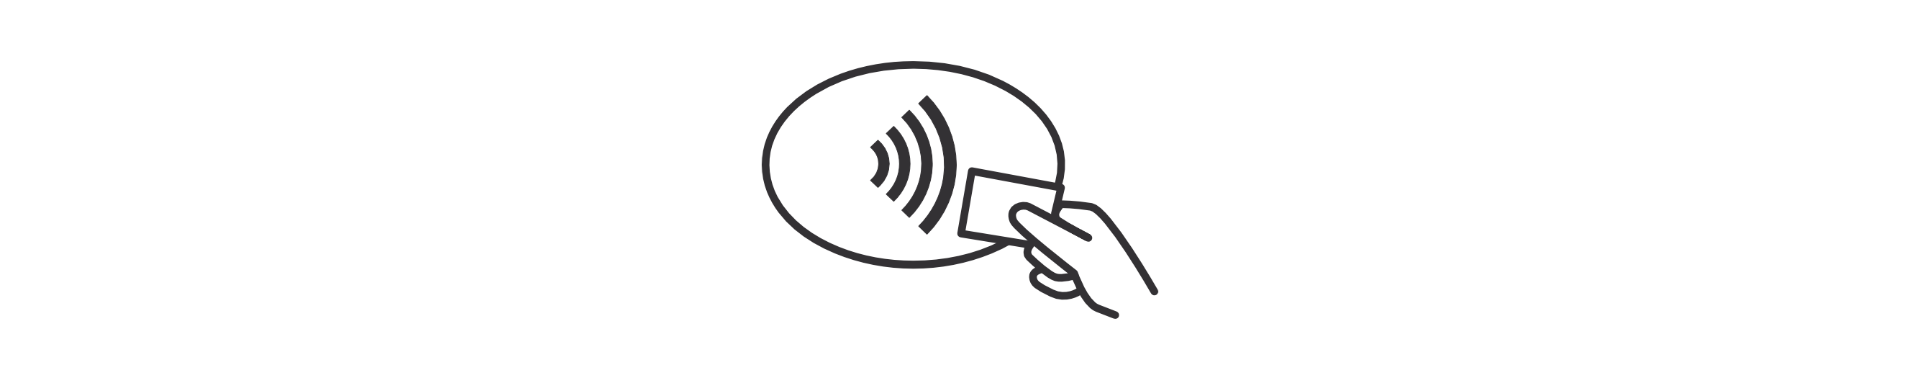 kontaktloses EMVCo-Logo